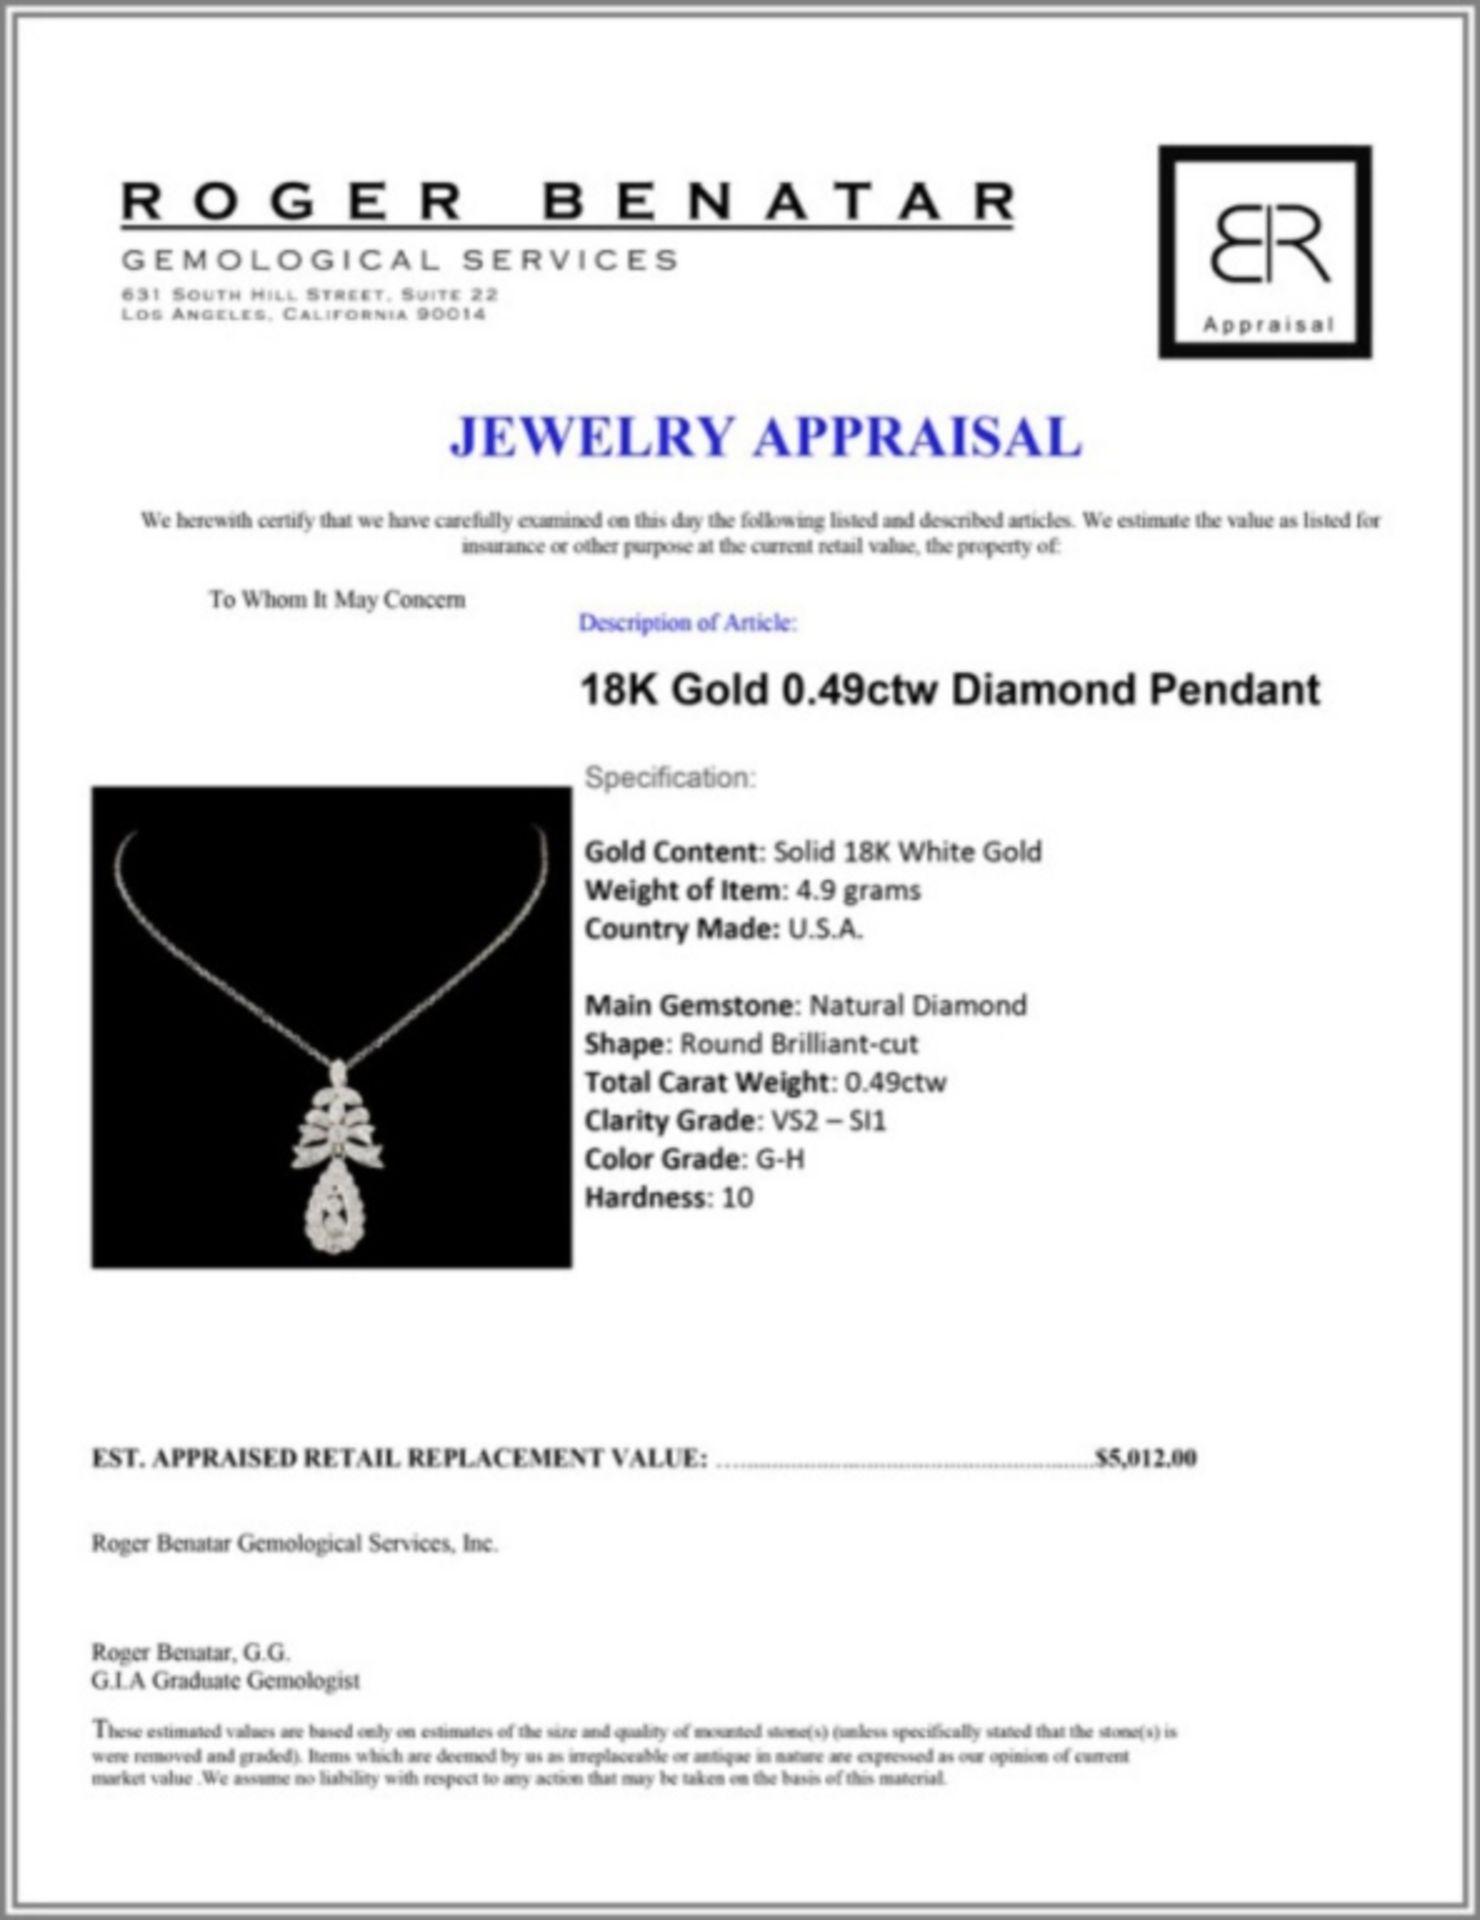 18K Gold 0.49ctw Diamond Pendant - Image 3 of 3